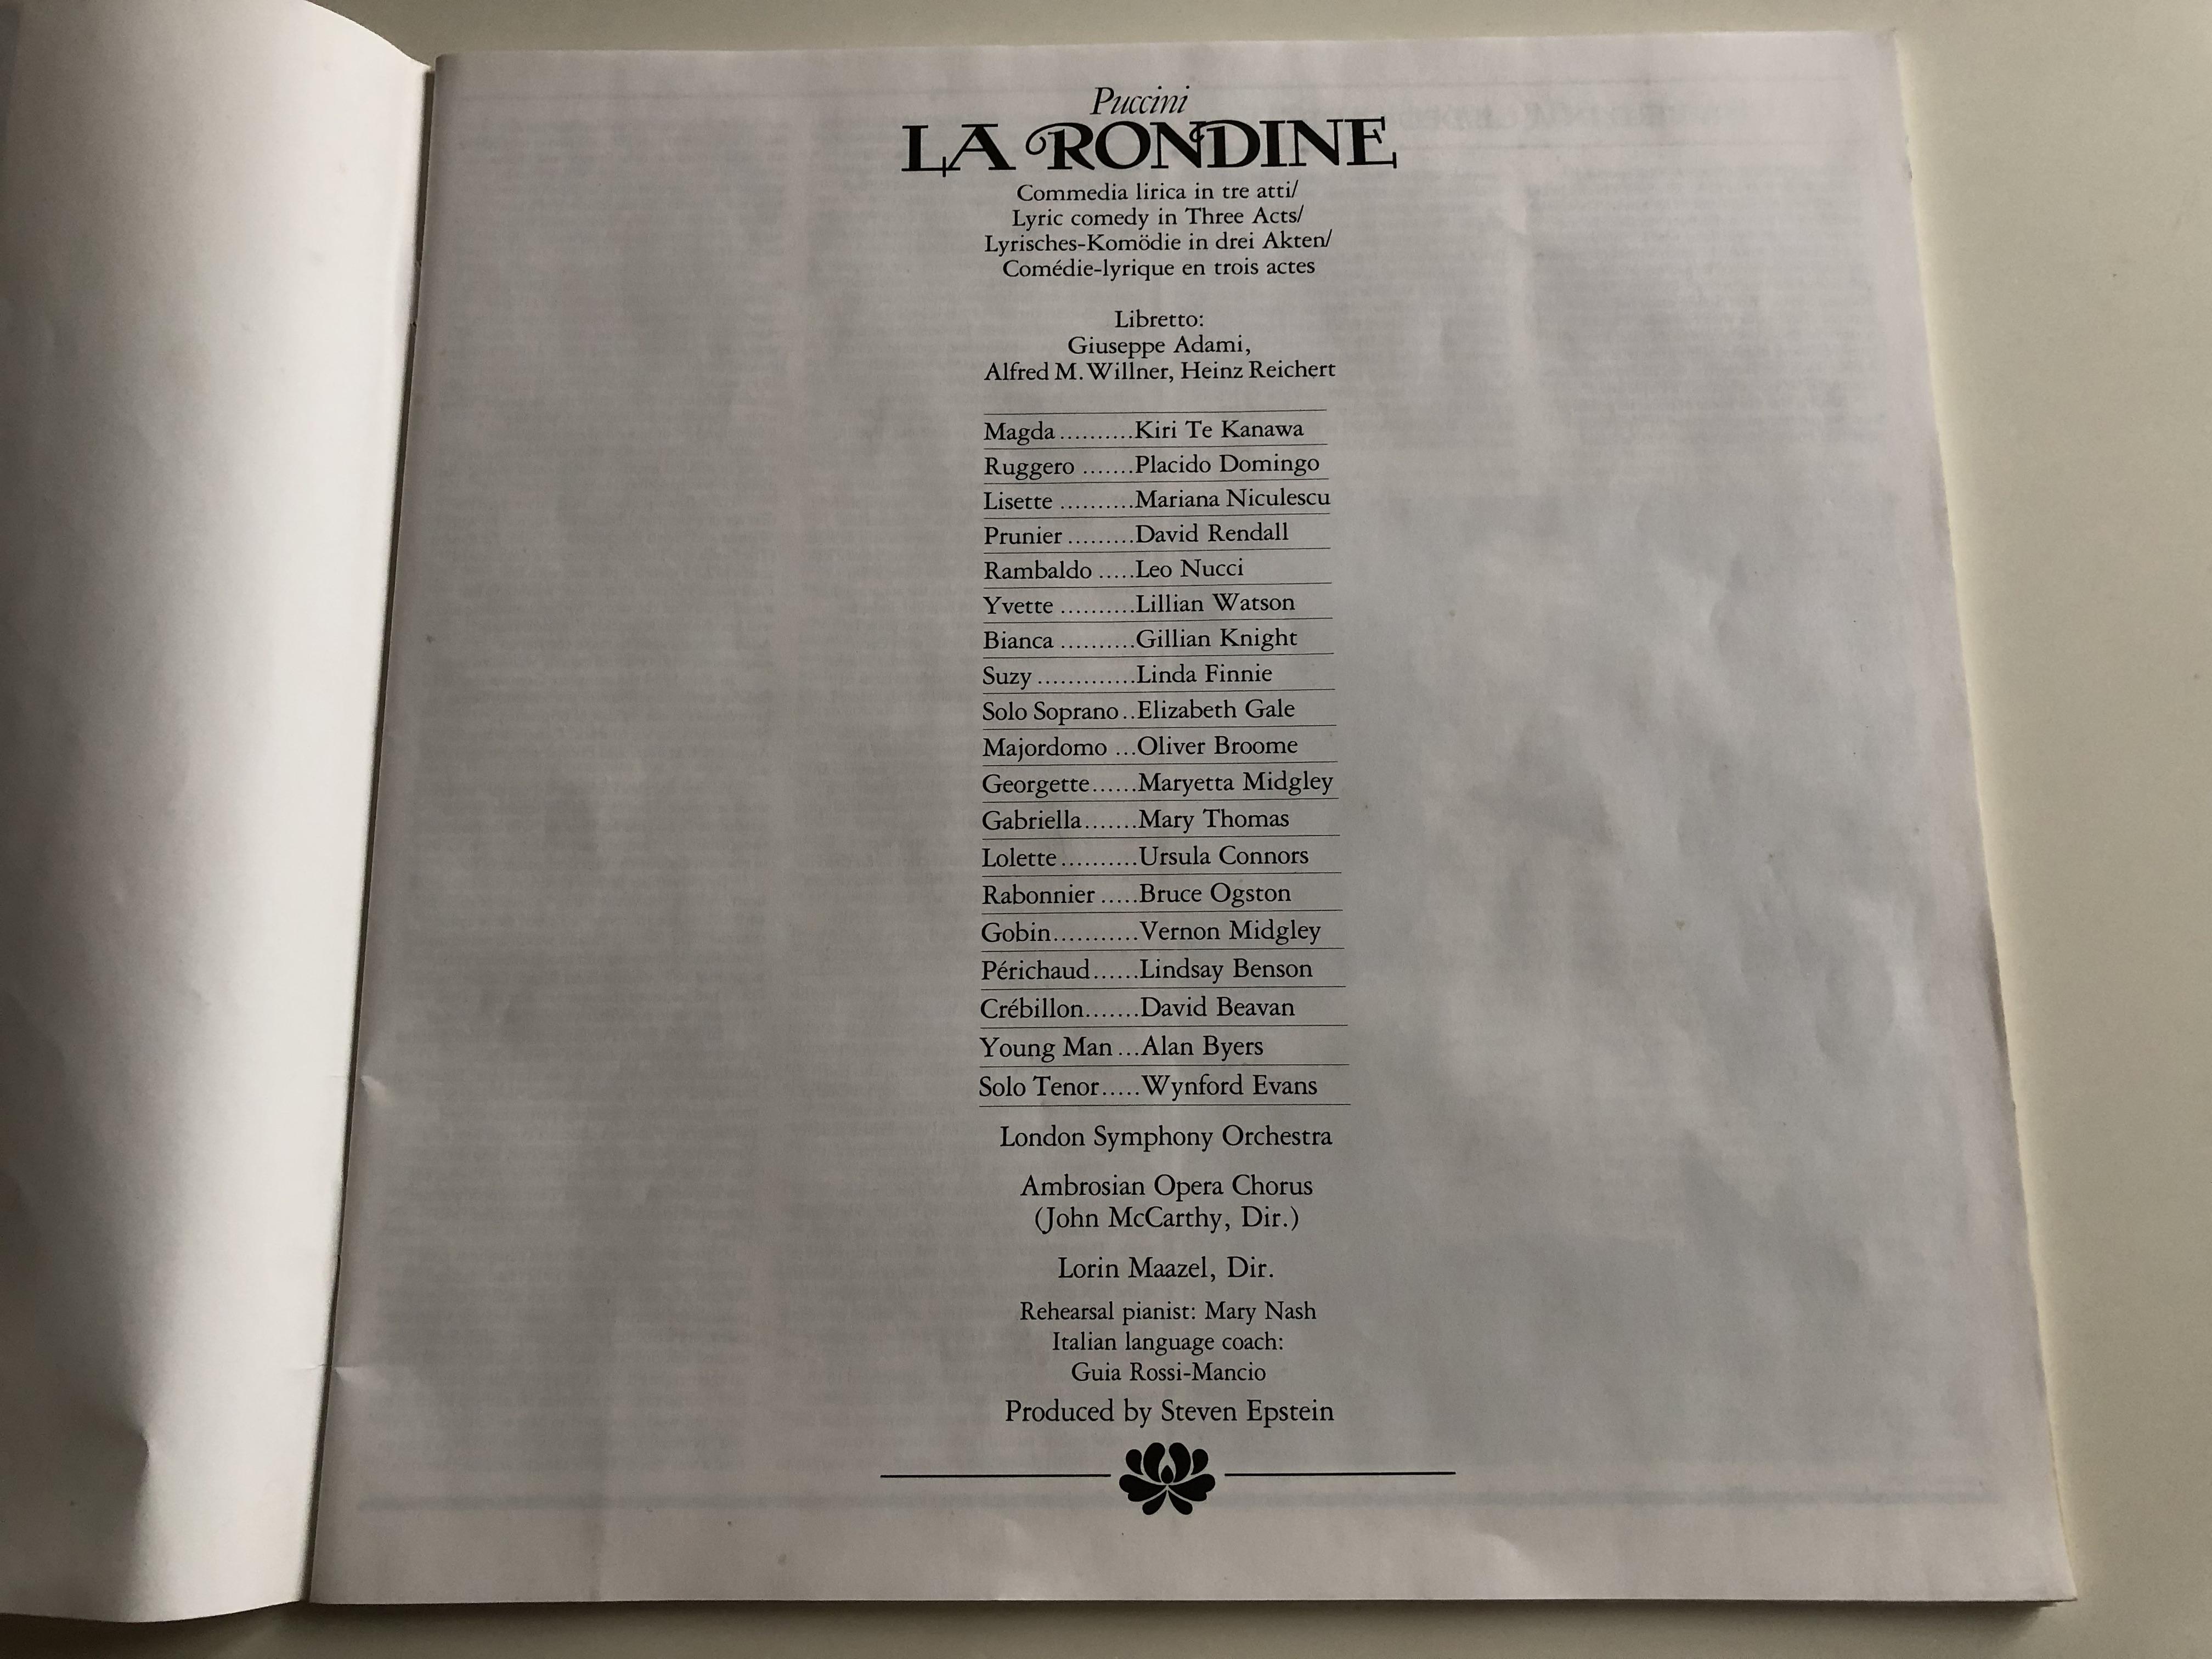 puccini-la-rondine-kiri-te-kanawa-placido-domingo-lorin-maazel-ambrosian-opera-chorus-london-symphony-orchestra-cbs-masterworks-2x-lp-digital-stereo-d2-37852-us-can-i2m-37852-4-.jpg